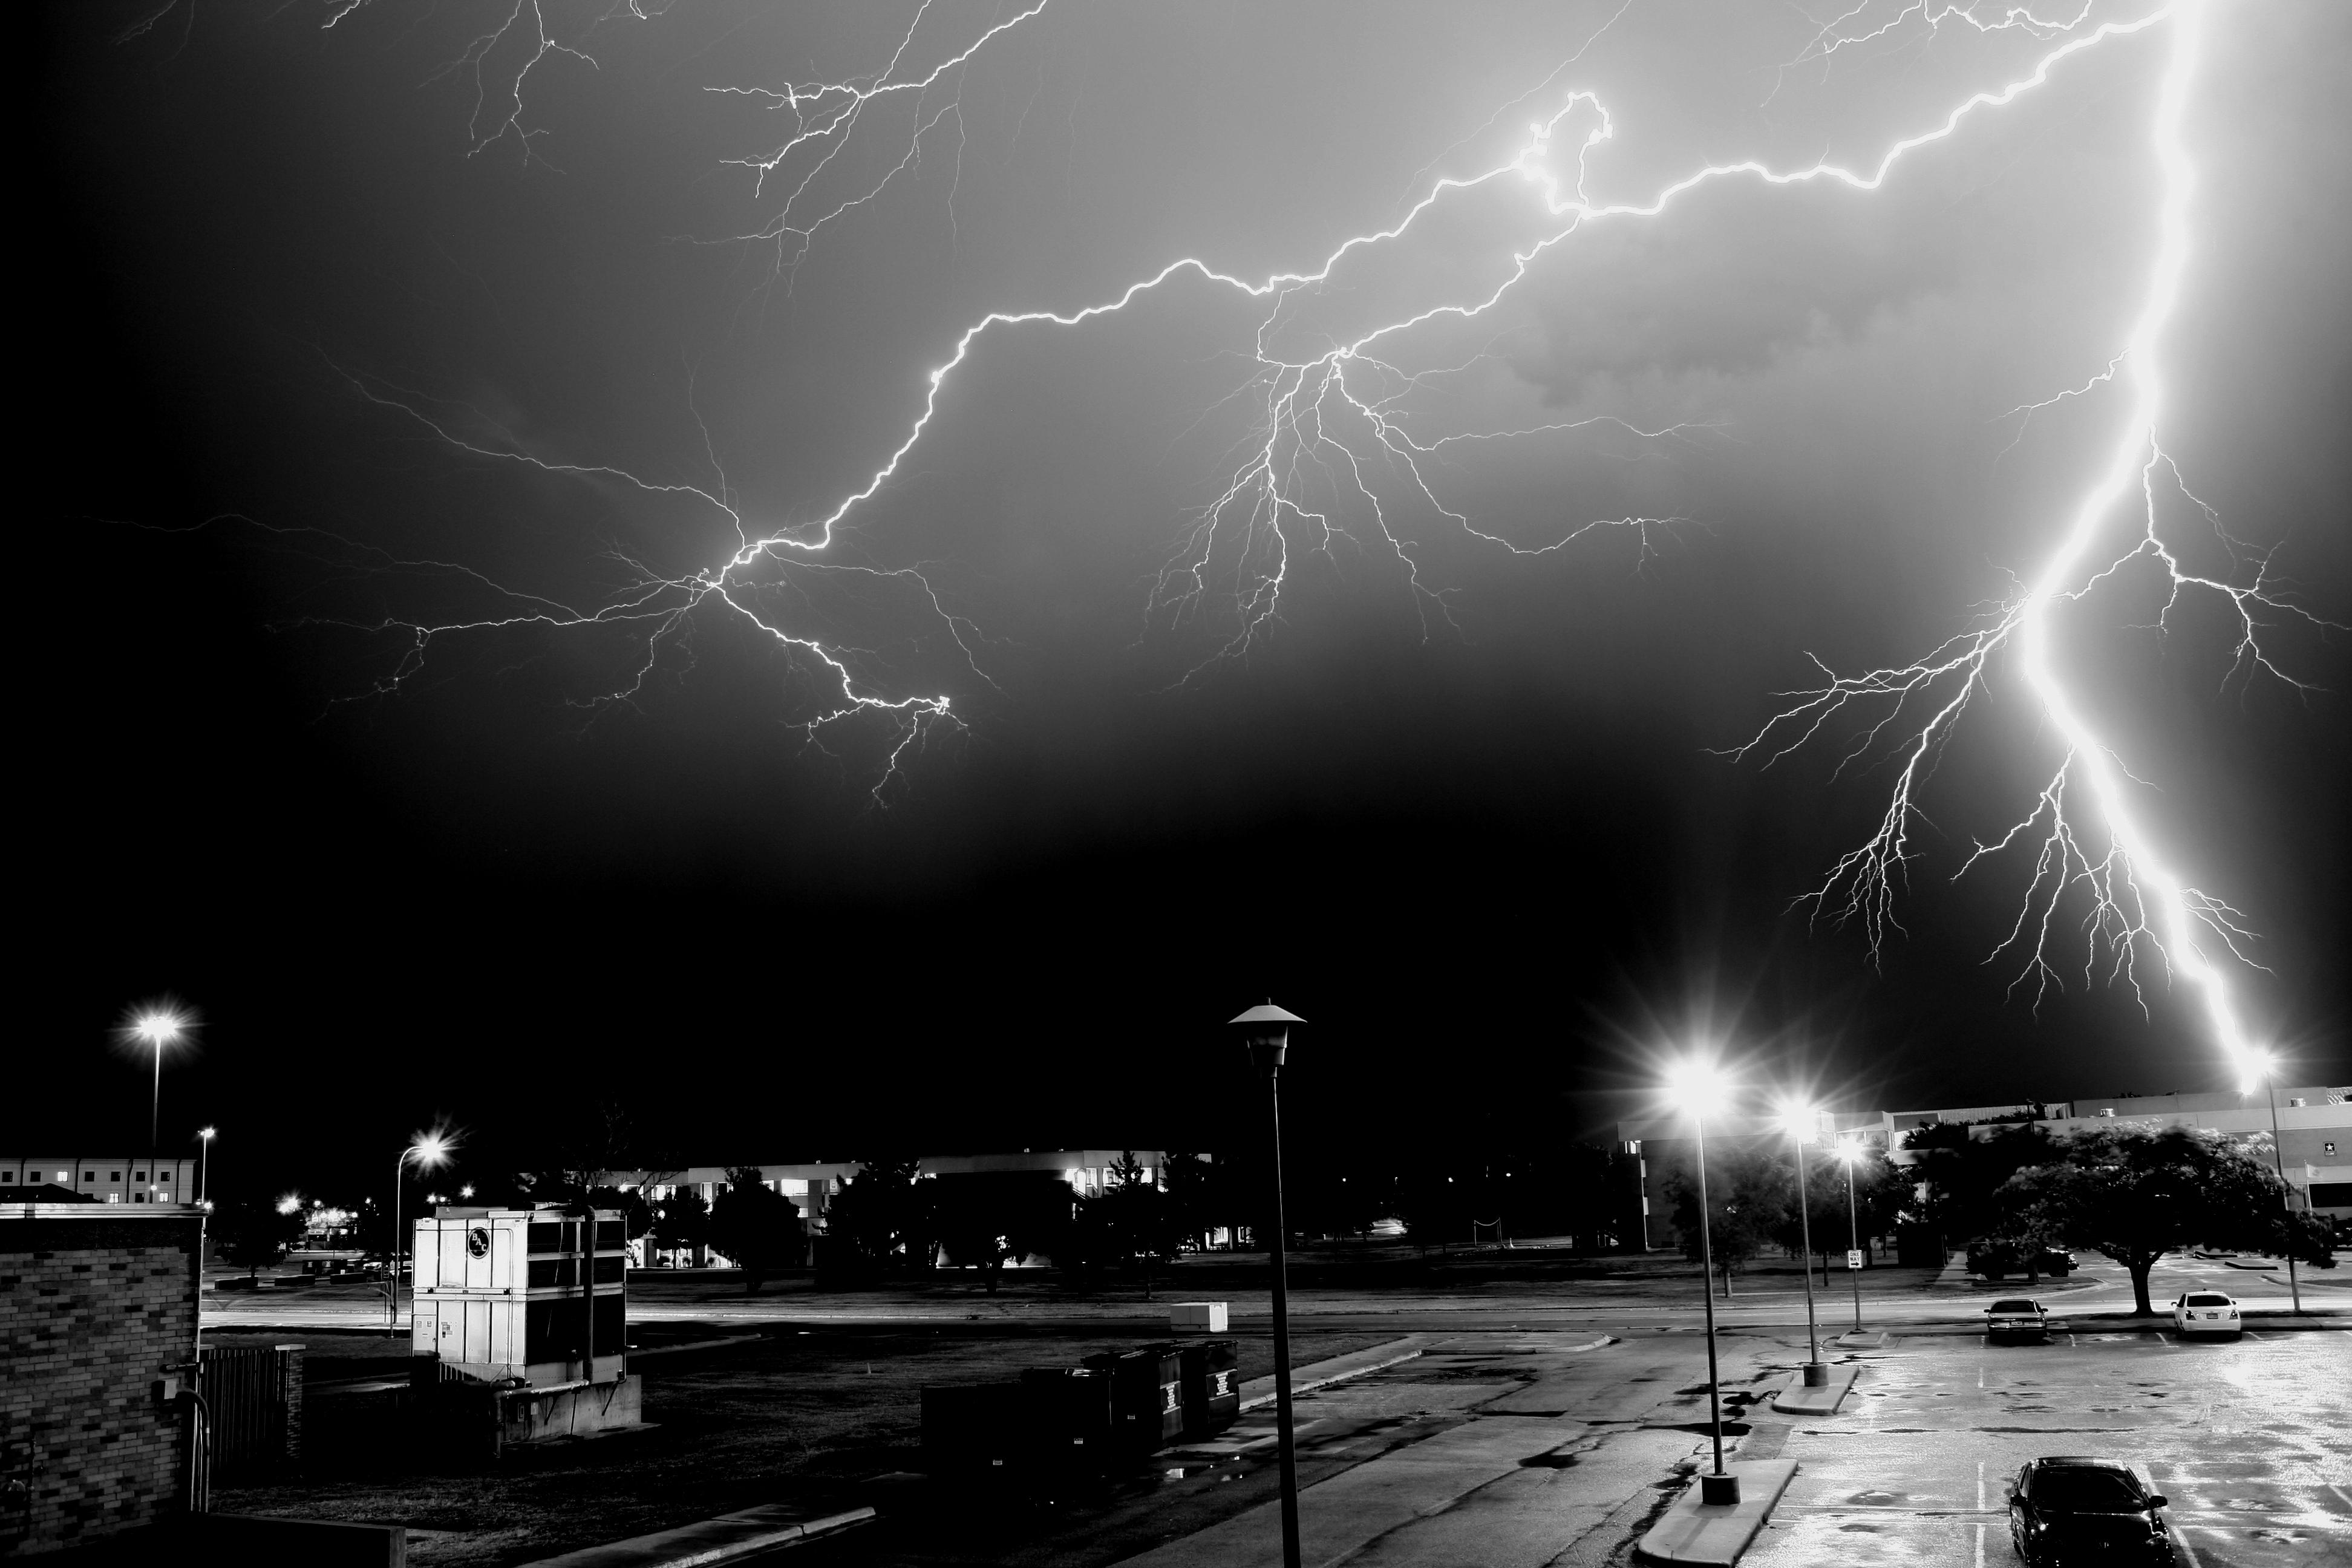 Lightning 4k ultra hd wallpaper background image 3888x2592 id 174625 wallpaper abyss - Lightning wallpaper 4k ...